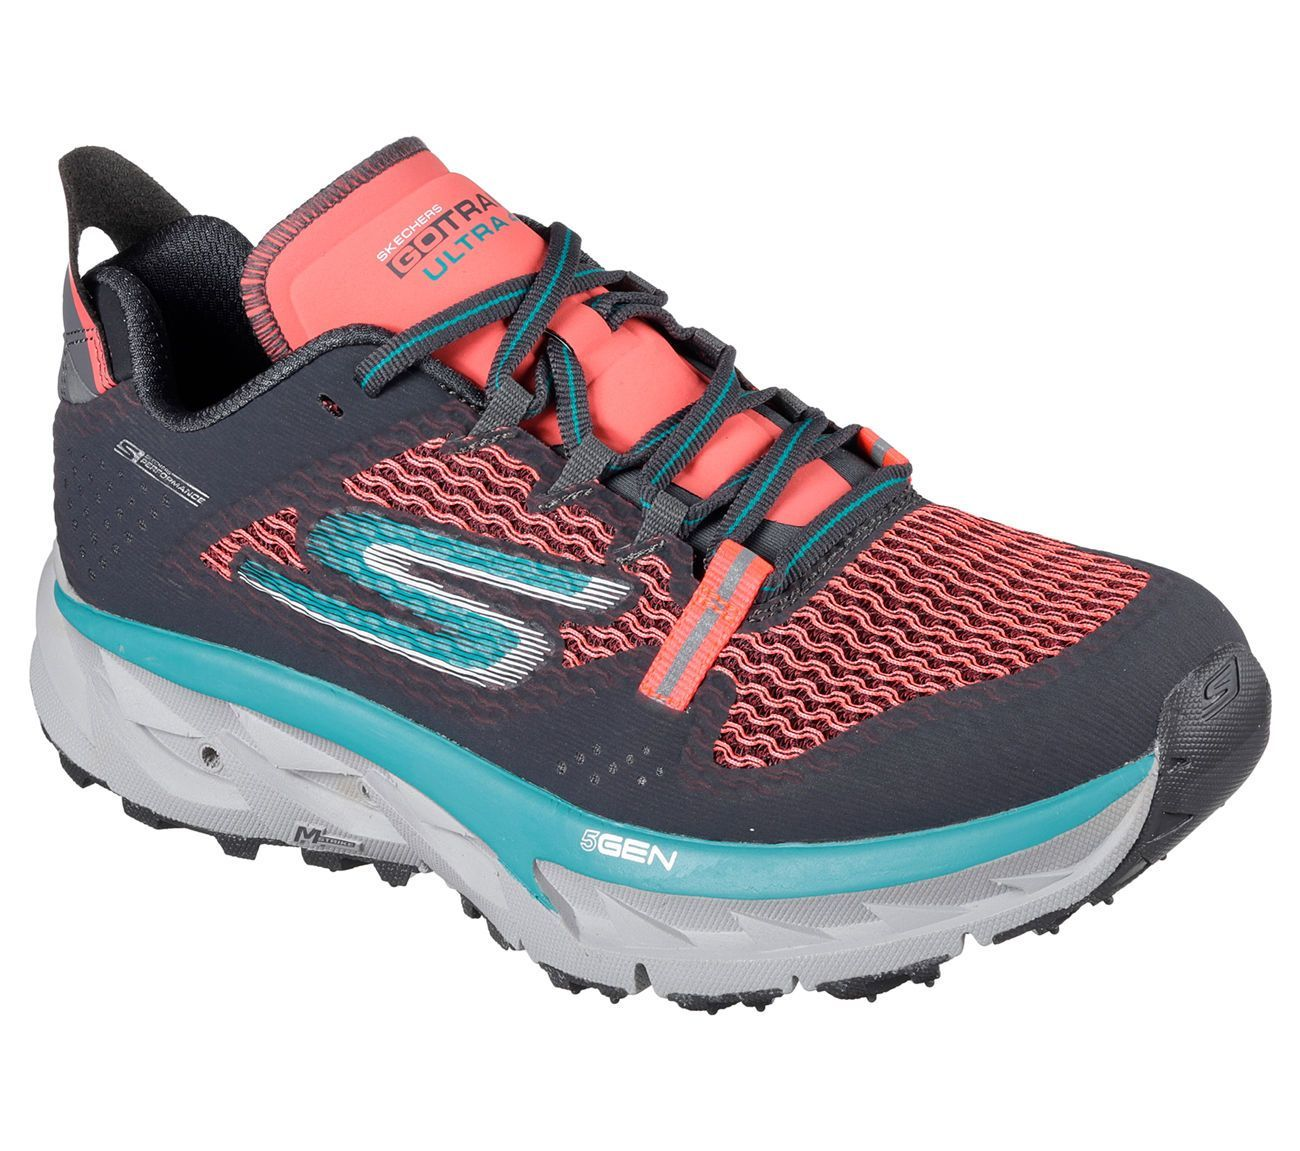 Skechers 14111 Cctl Women'S Gotrail Ultra 4 Running